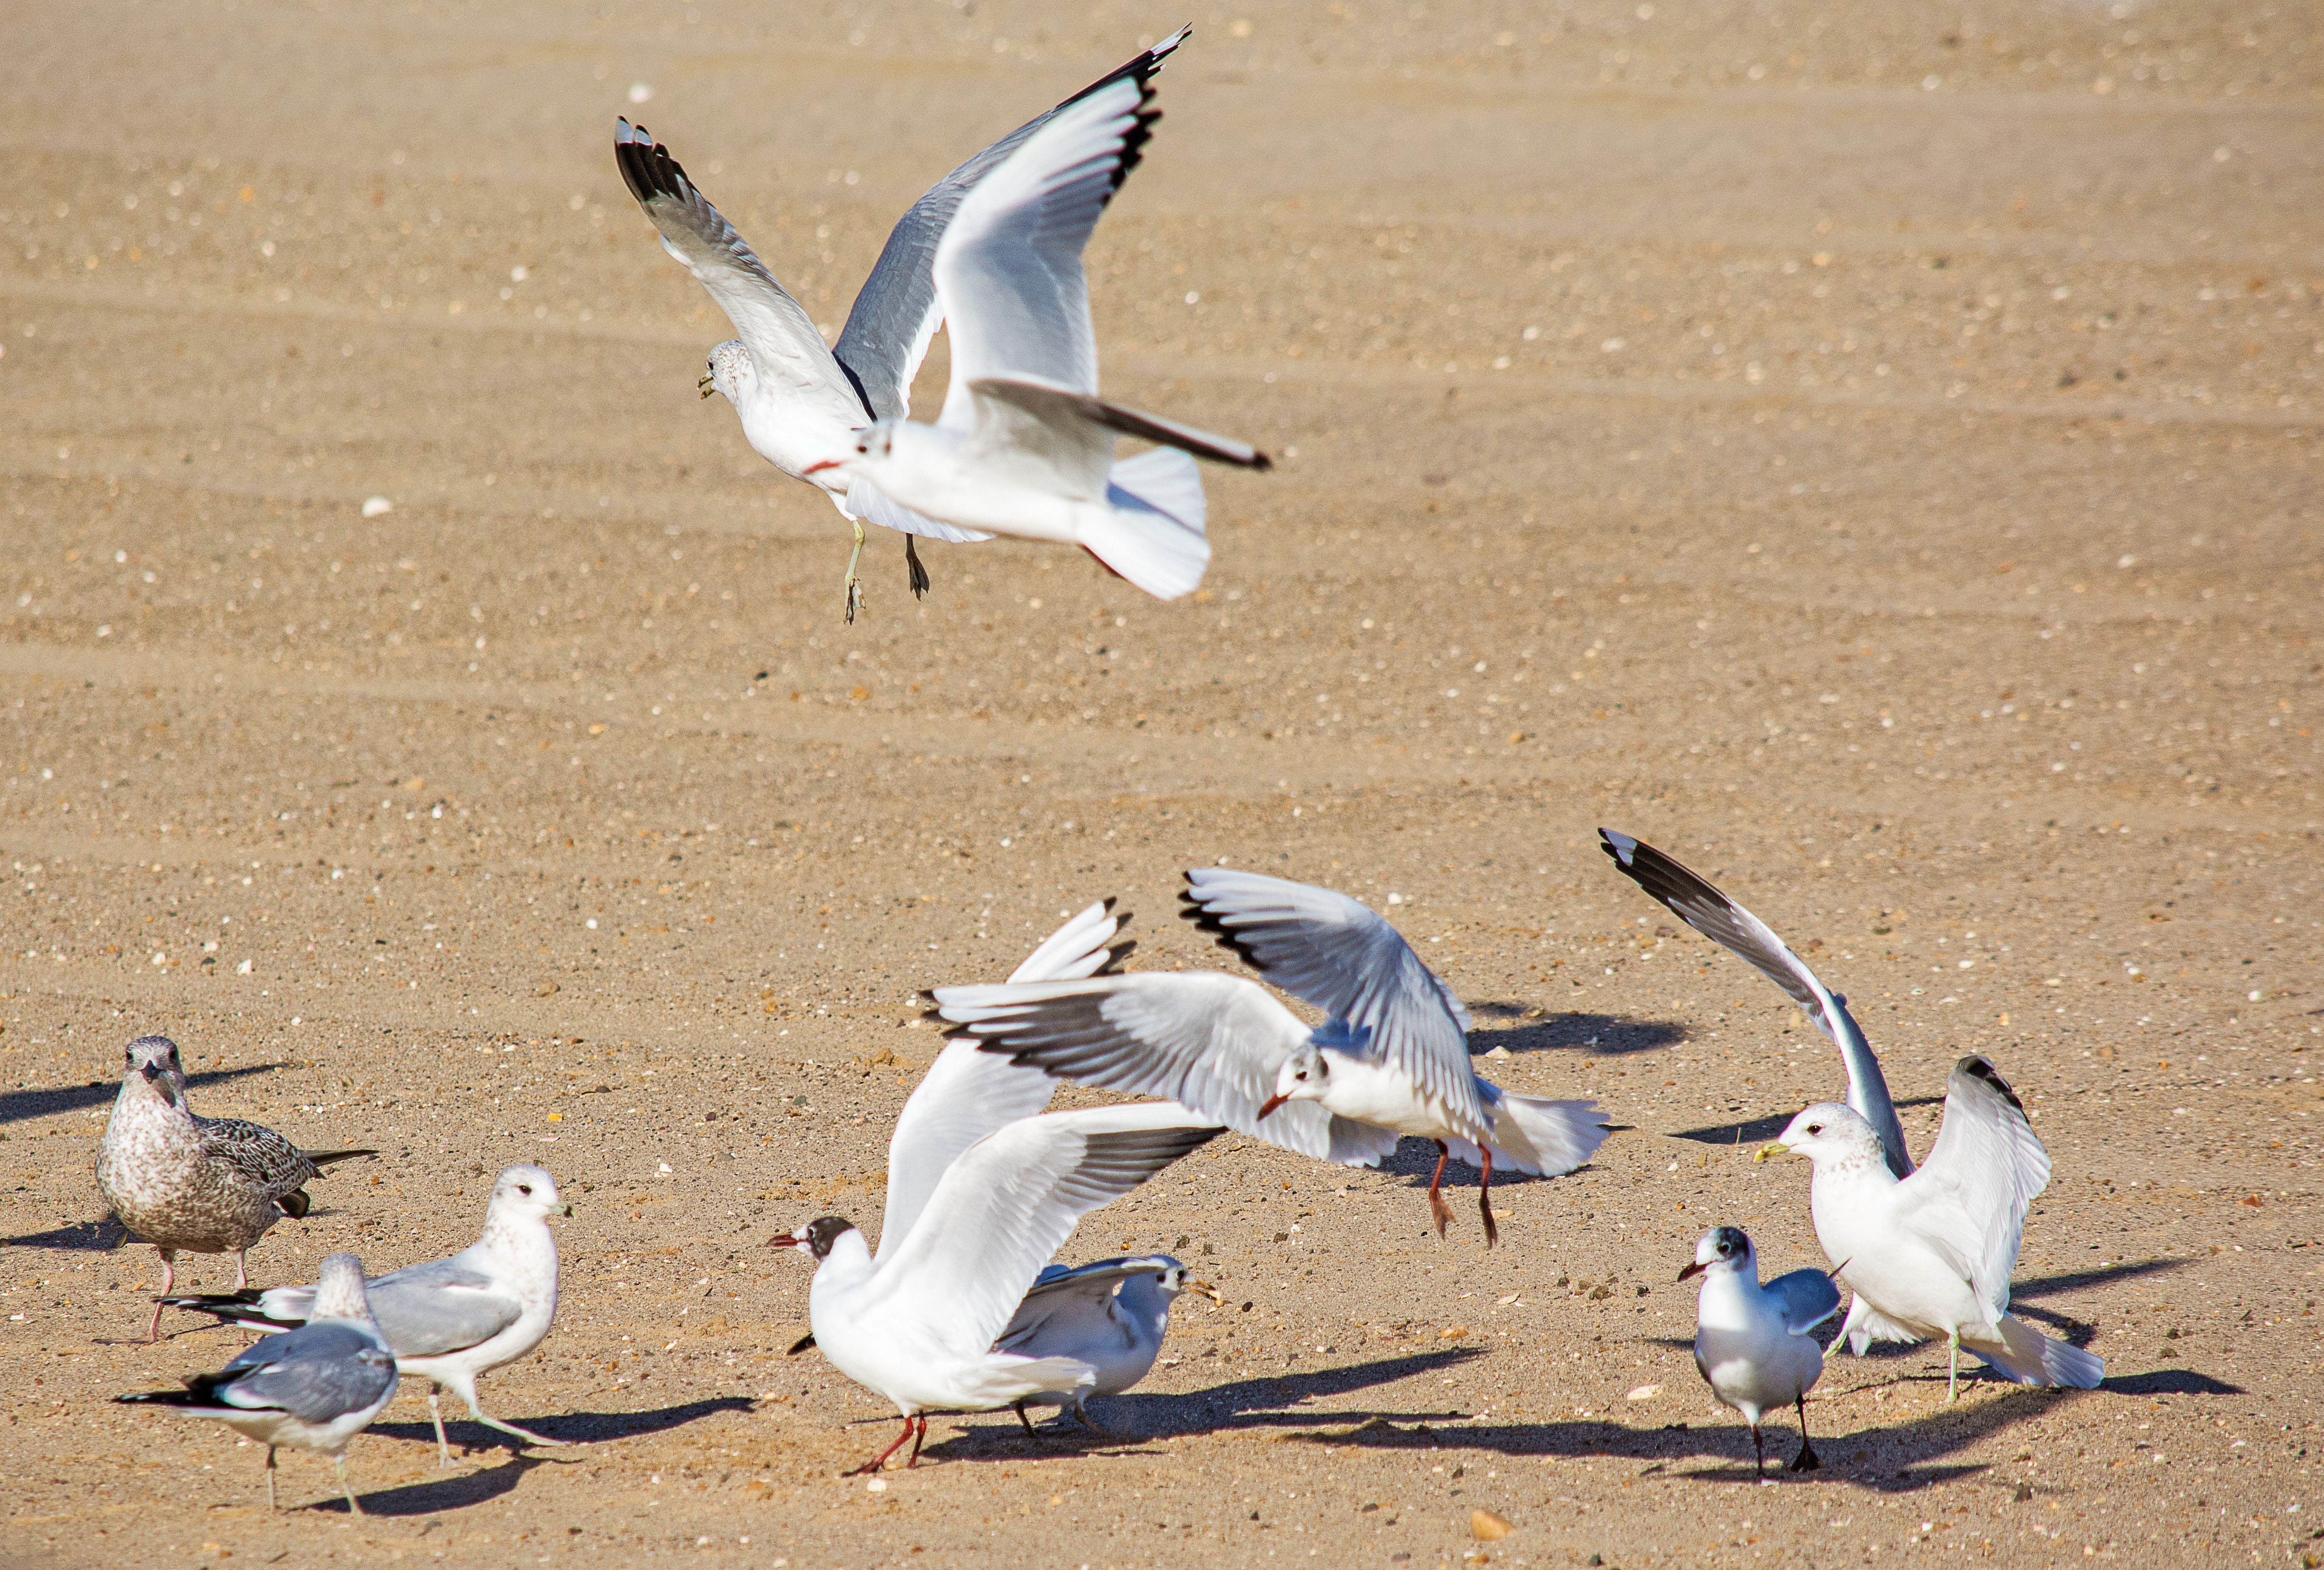 Seagulls 20